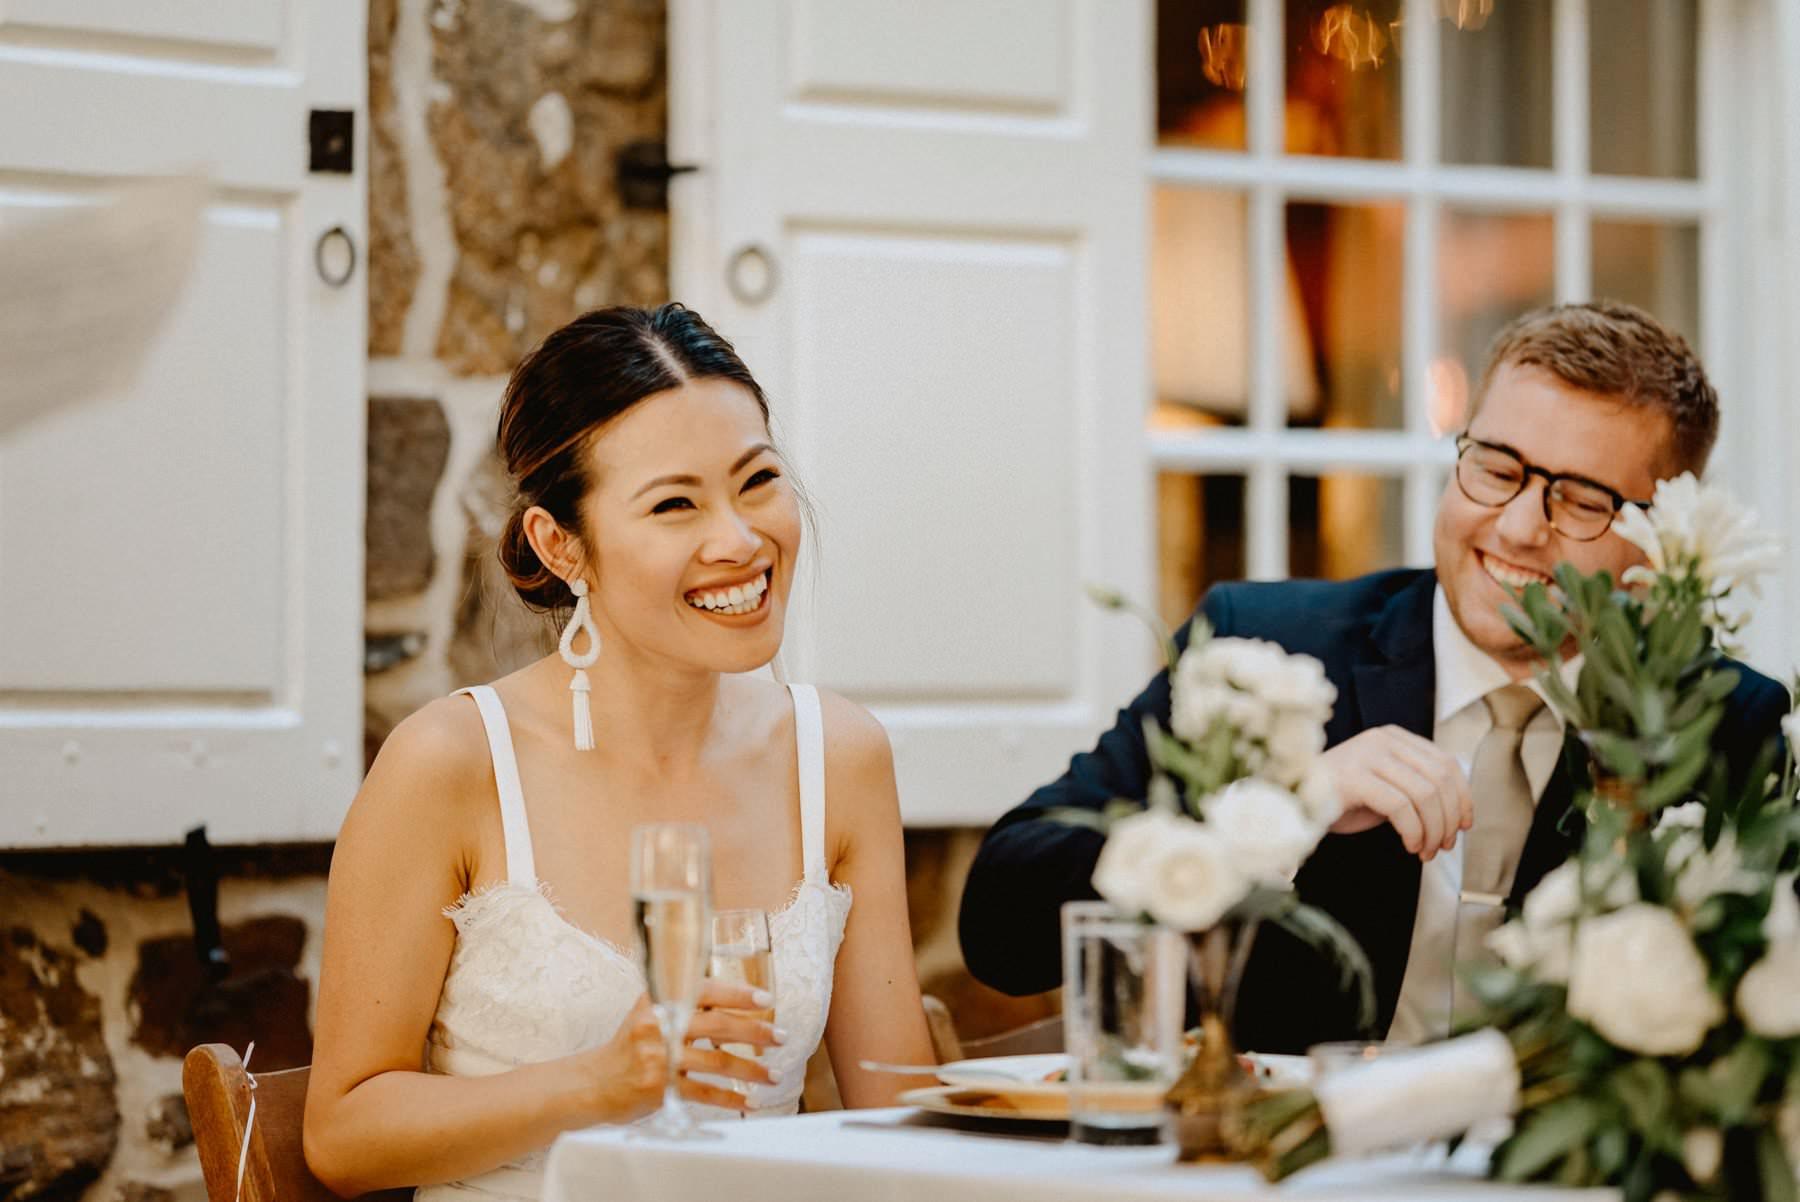 Appleford-estate-wedding-124.jpg